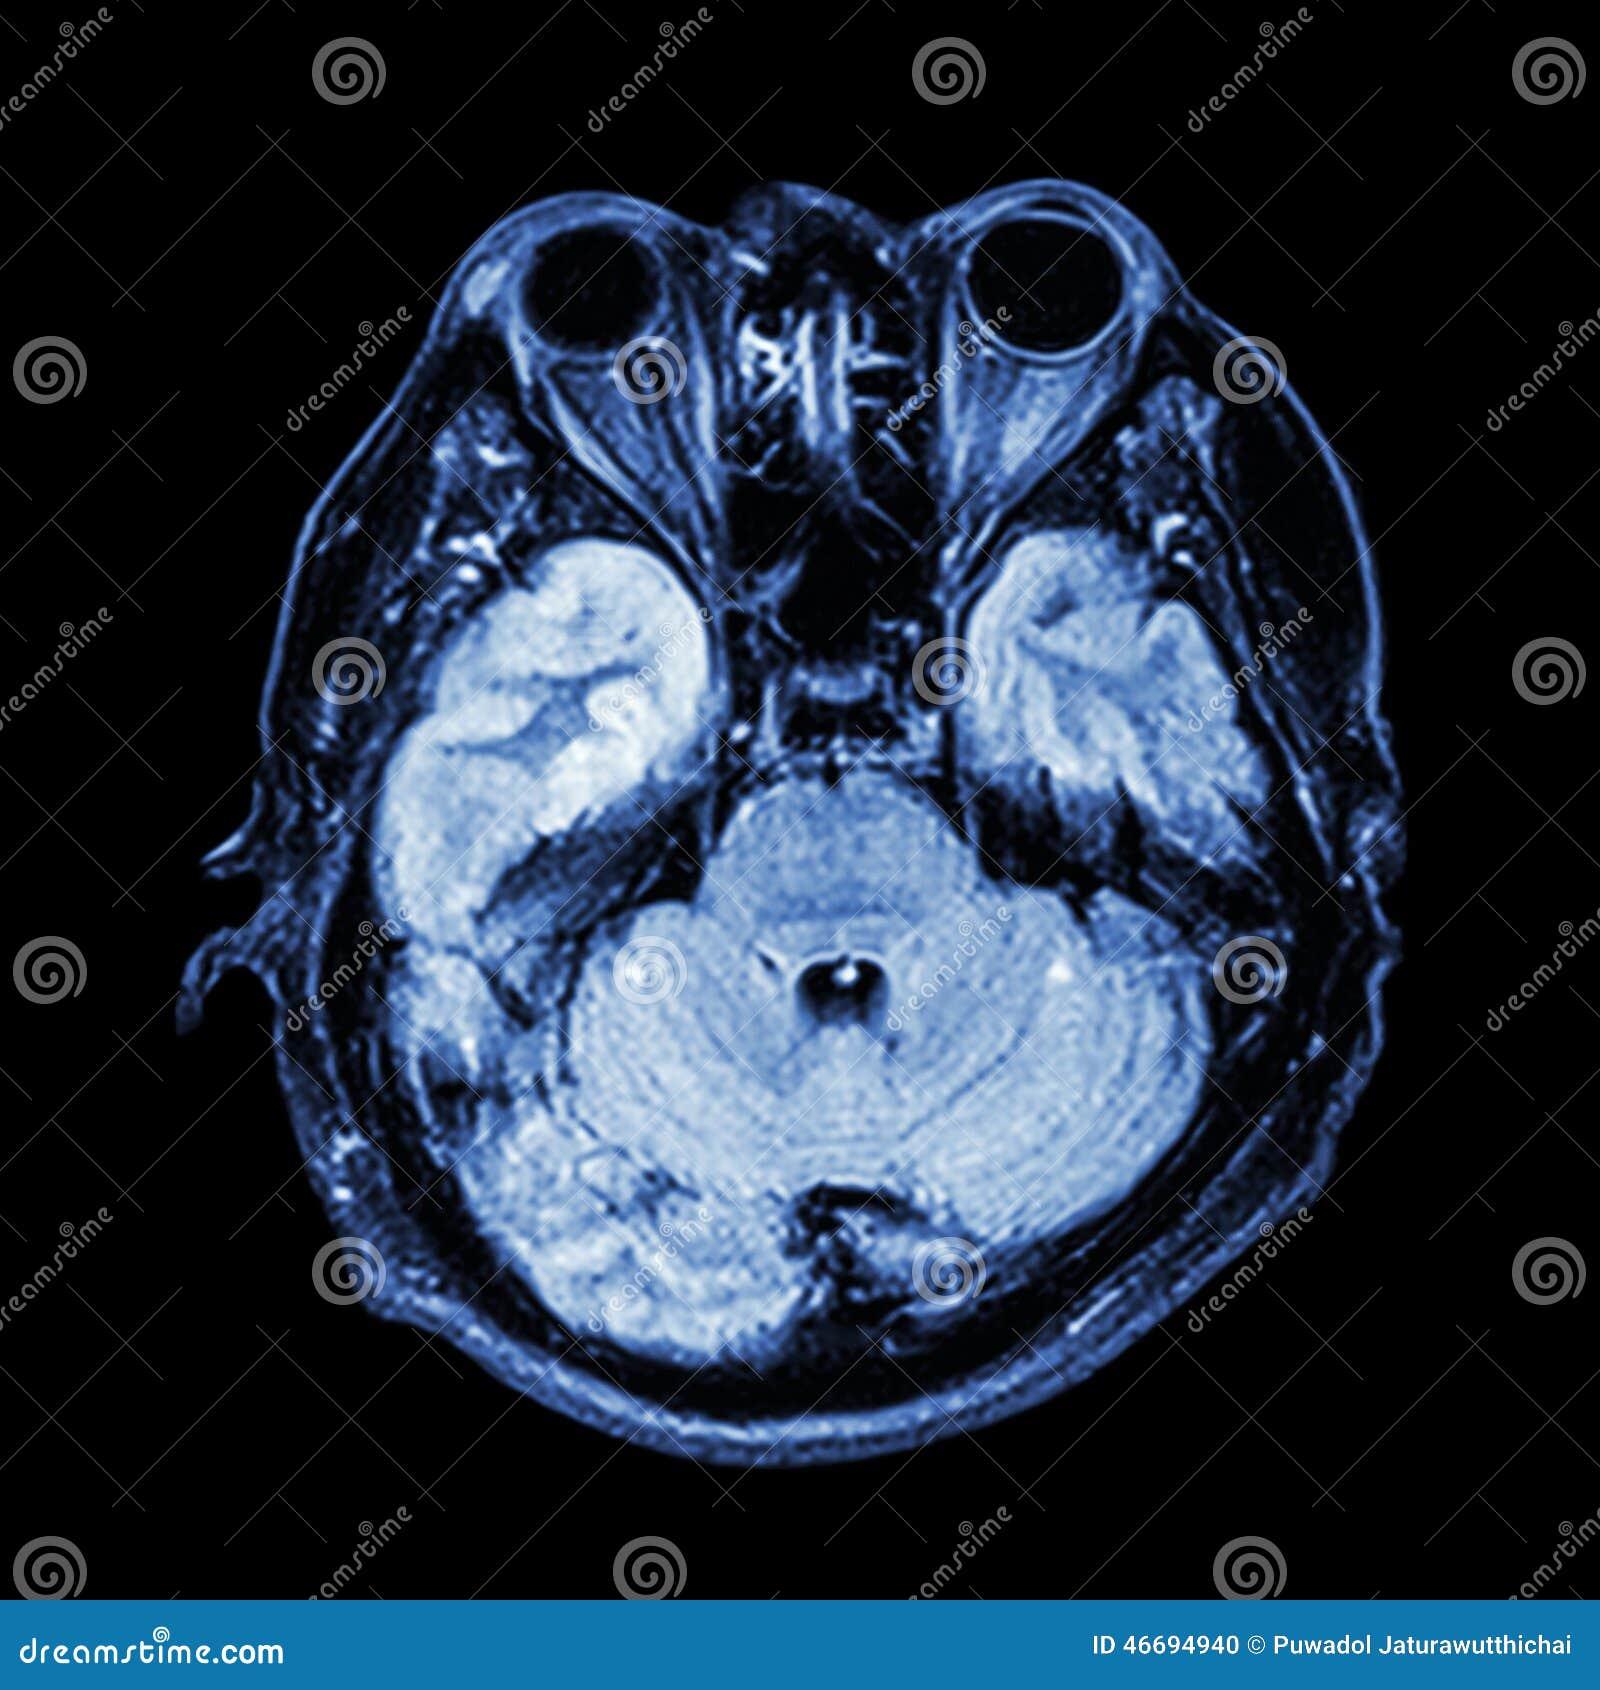 stem,eye,ethmoid sinus